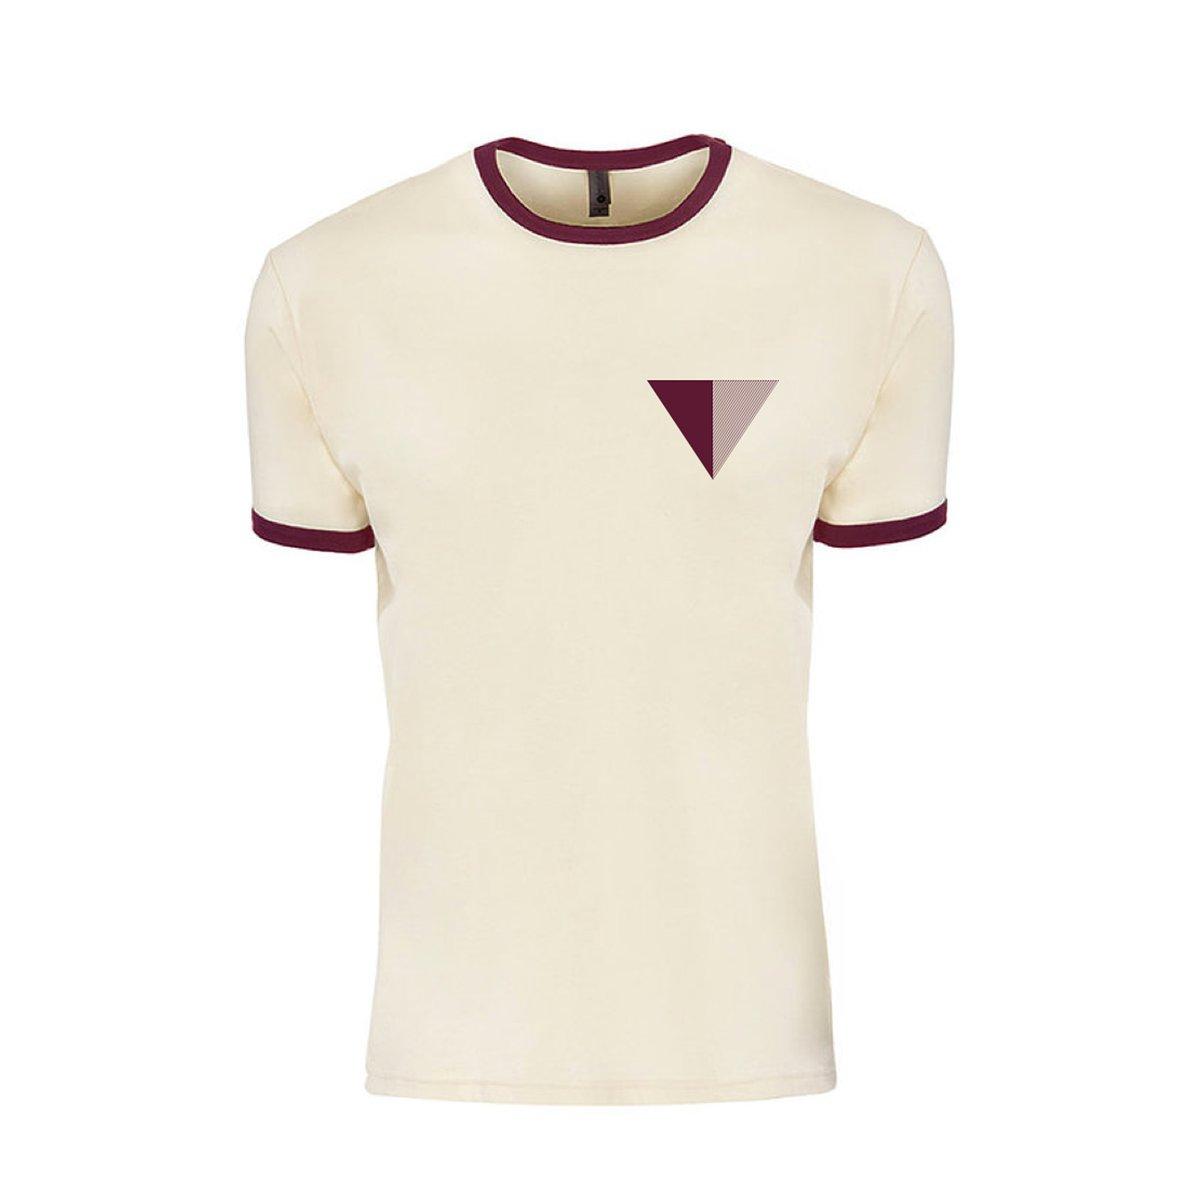 "Image of VIS ""Light Lost"" Shirt"